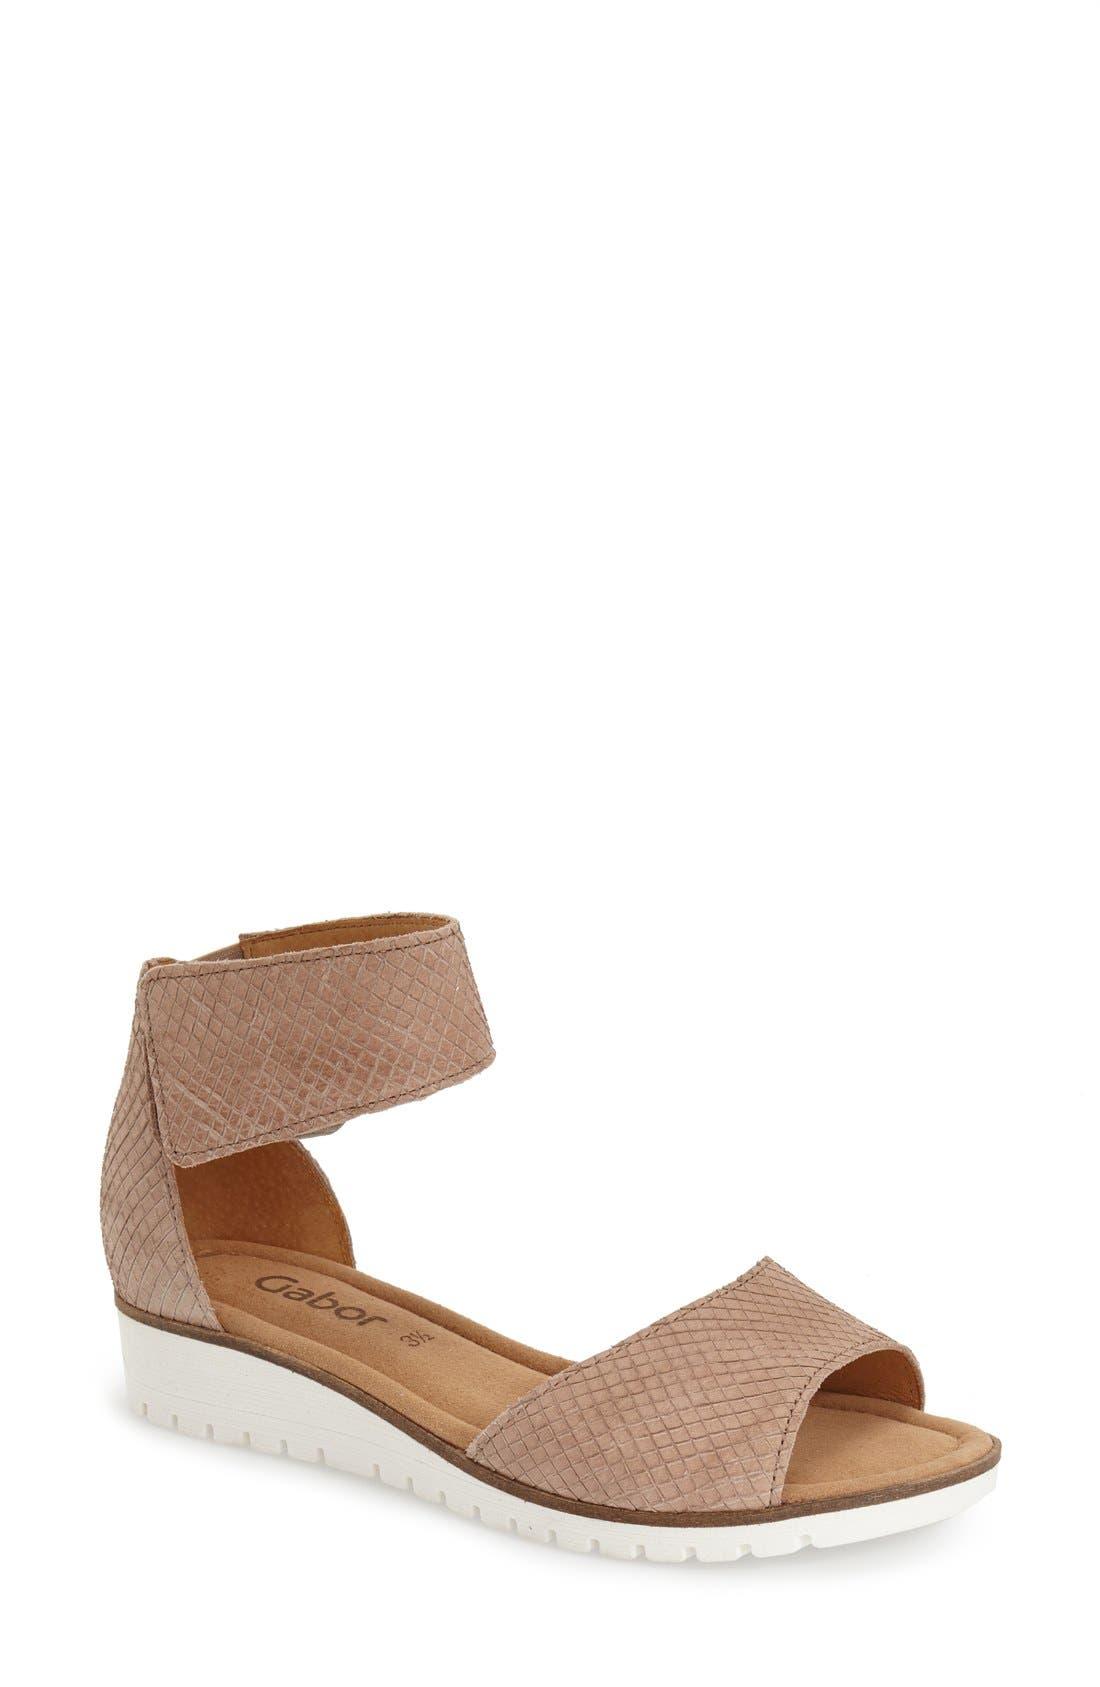 GABOR Two-Strap Sandal